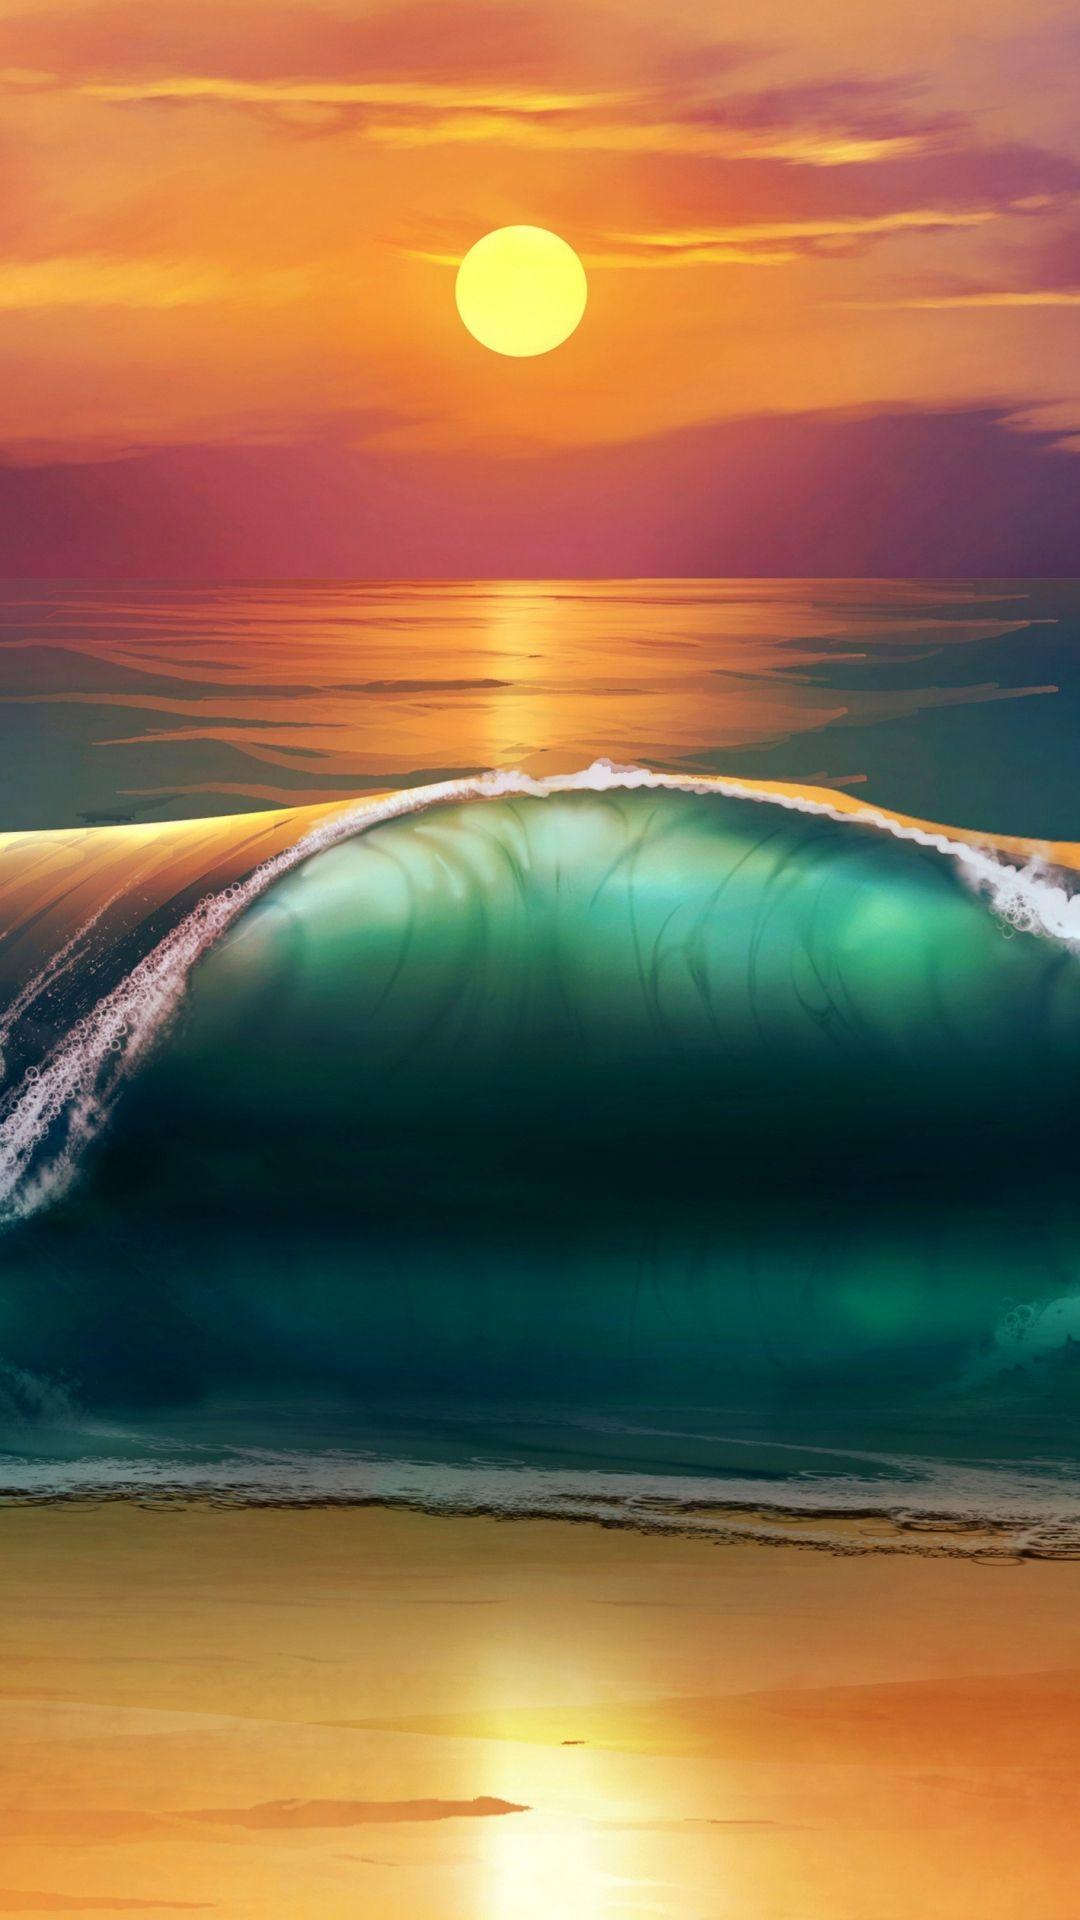 Art Sunset Beach Sea Waves Iphone 8 Wallpapers Ocean Waves